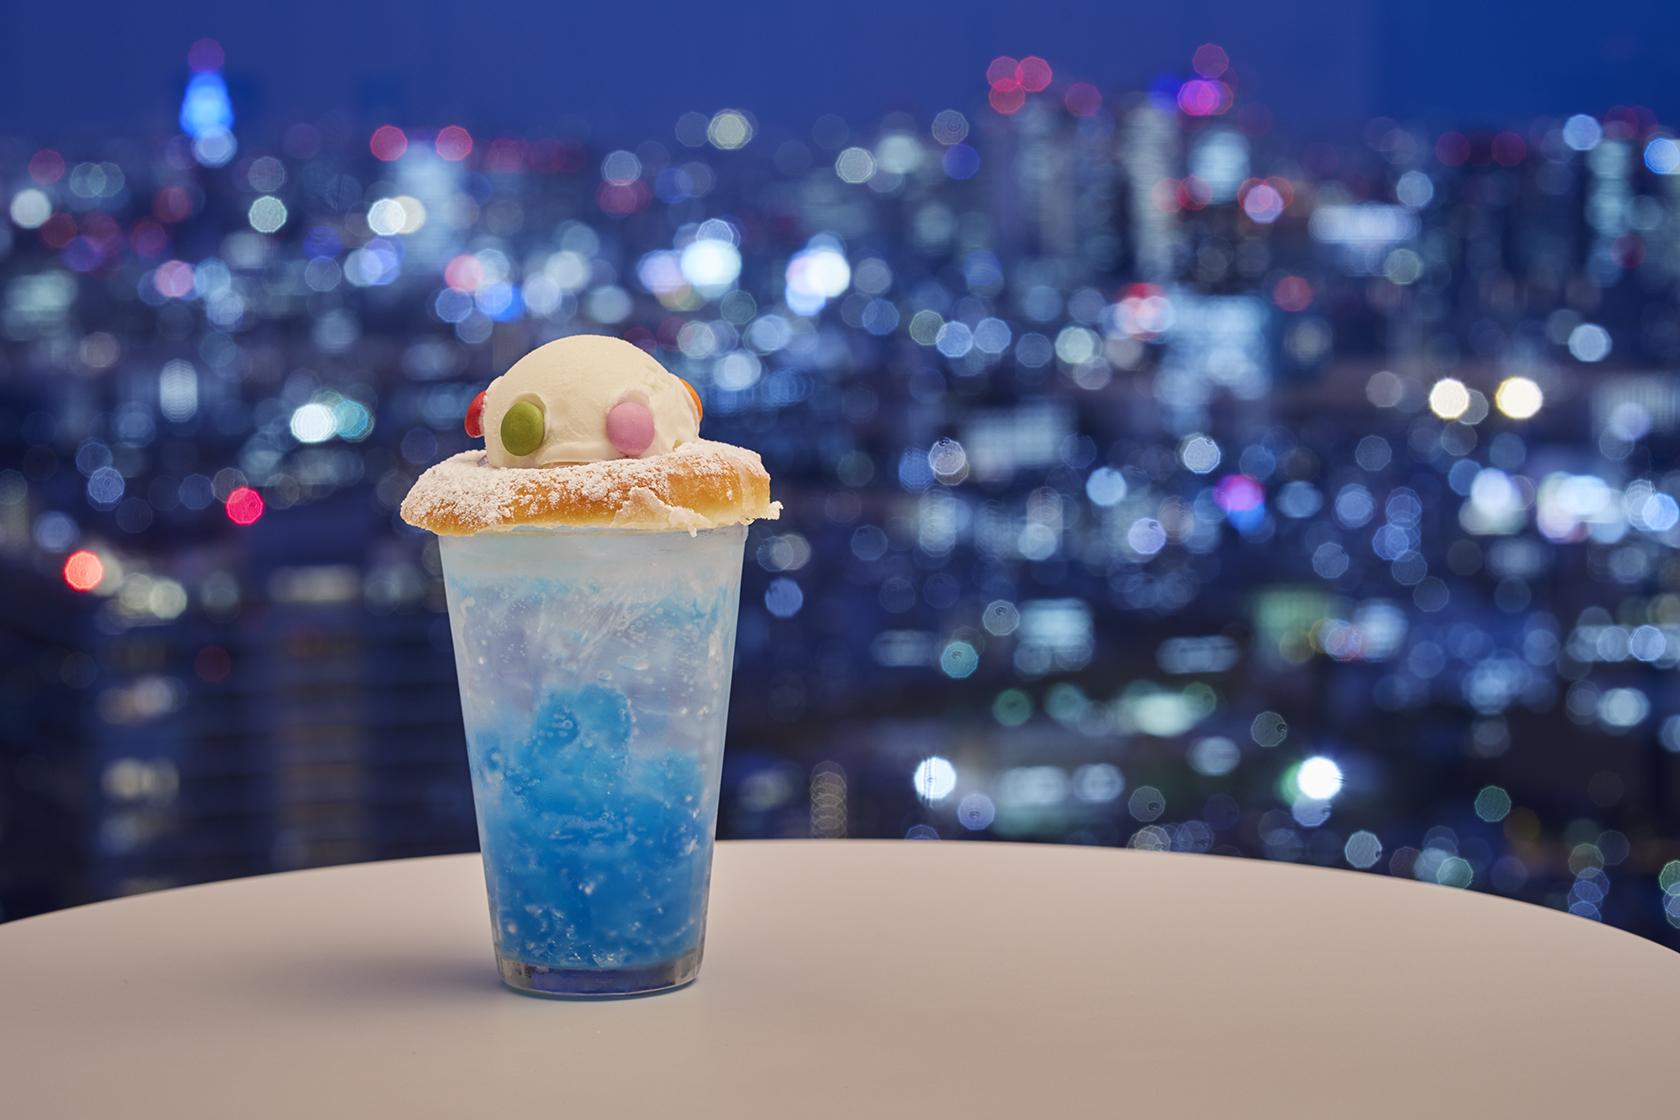 Cafe Quu Quu Quu:UFOをイメージした期間限定特別メニュー「UFOソーダ」(750円)